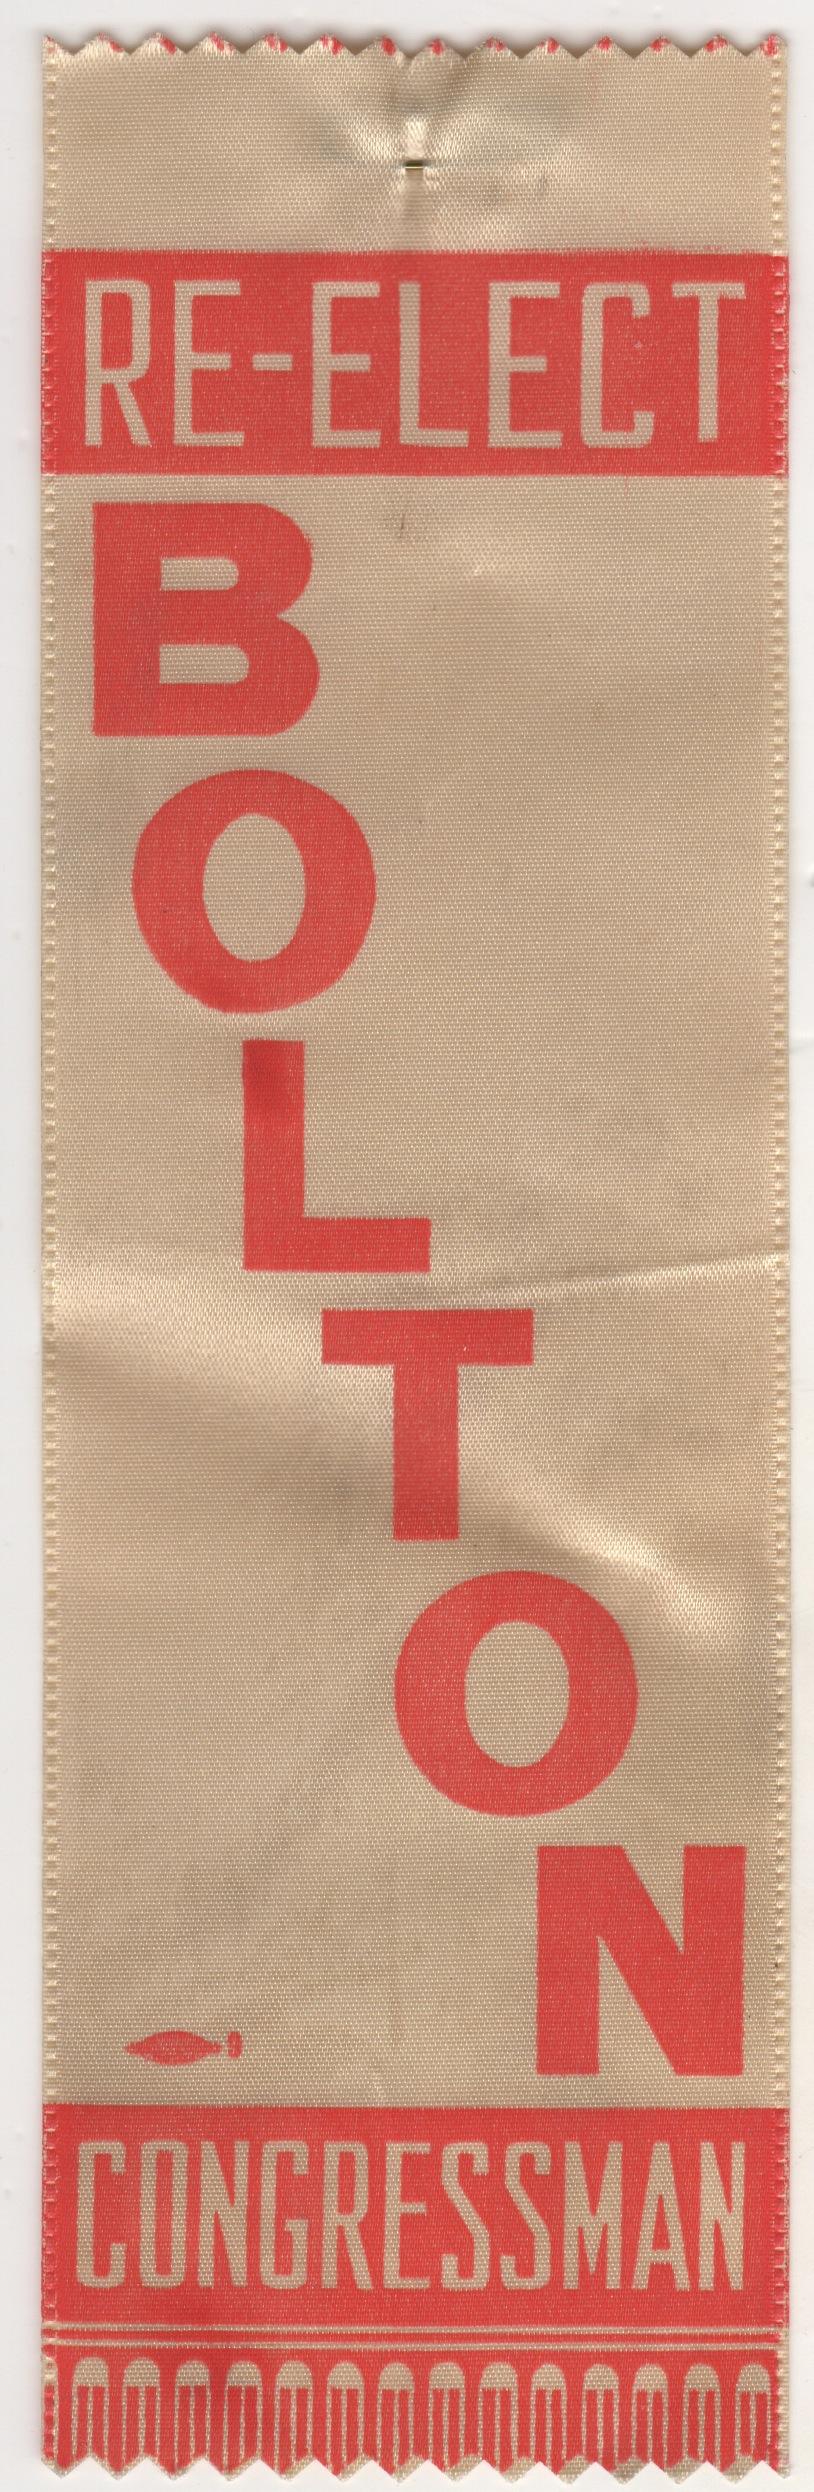 OHCong-BOLTON07.jpeg